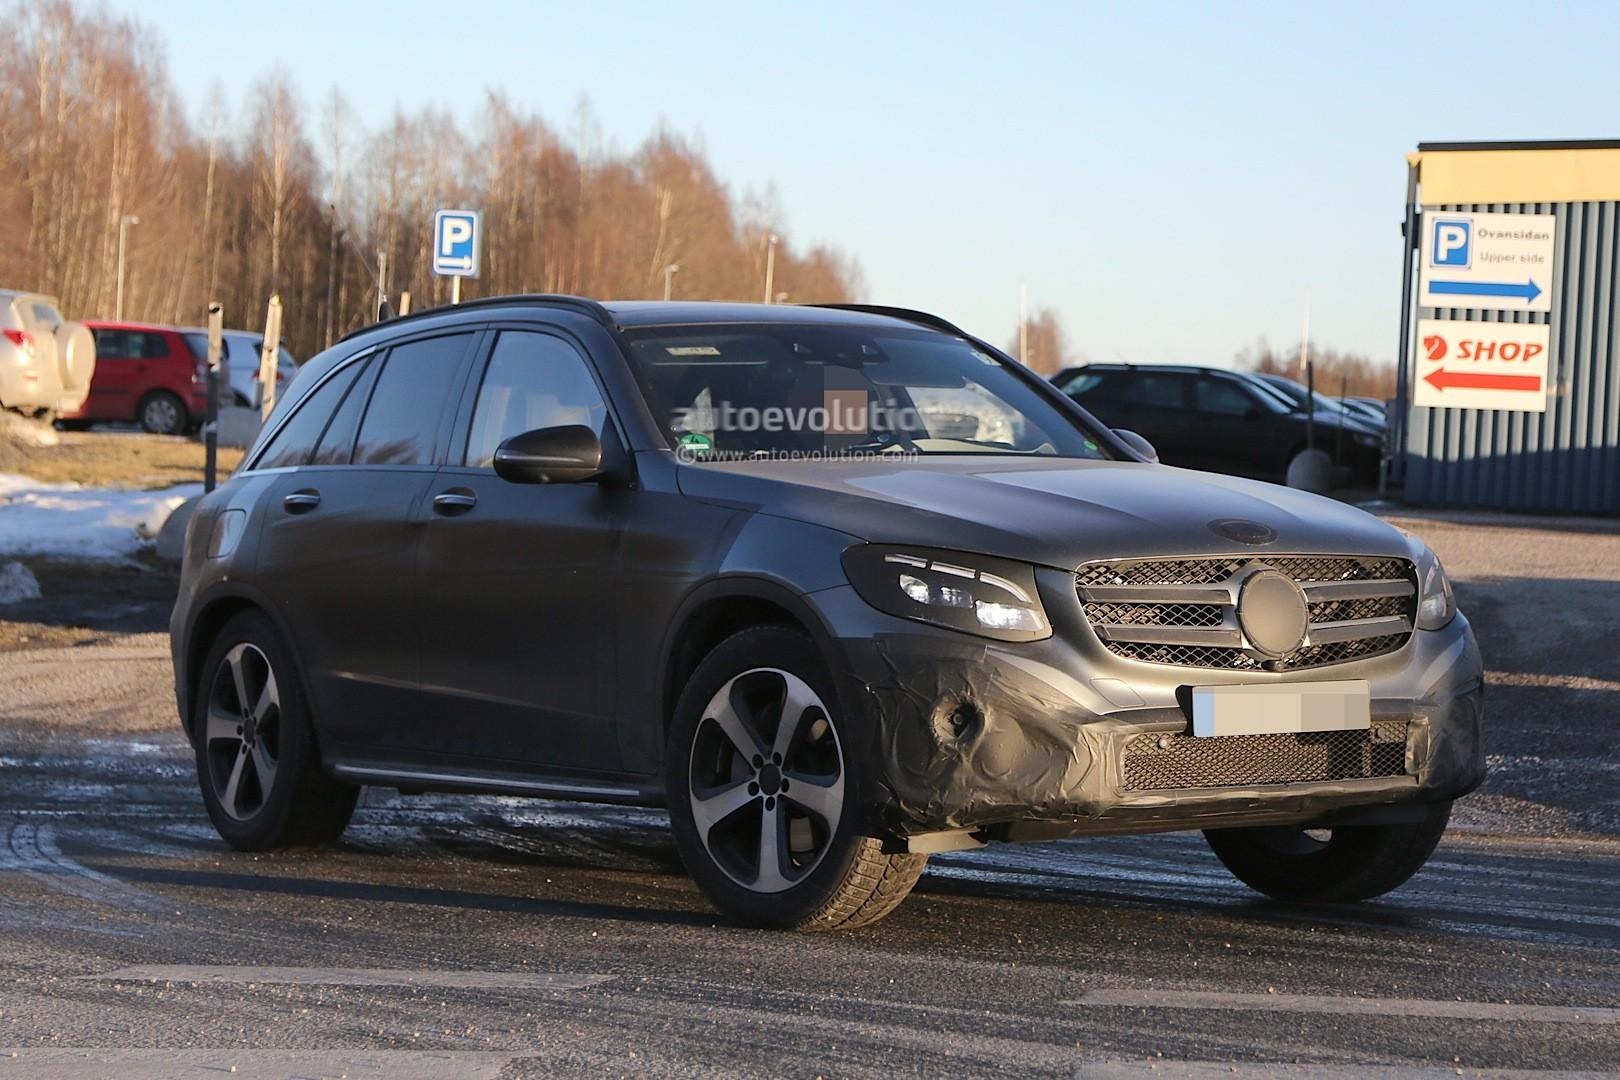 2015 - [Mercedes] GLC (GLK II) [X205] - Page 10 2016-mercedes-glc-spy-photos-show-nearly-undisguised-pre-production-prototypes_22